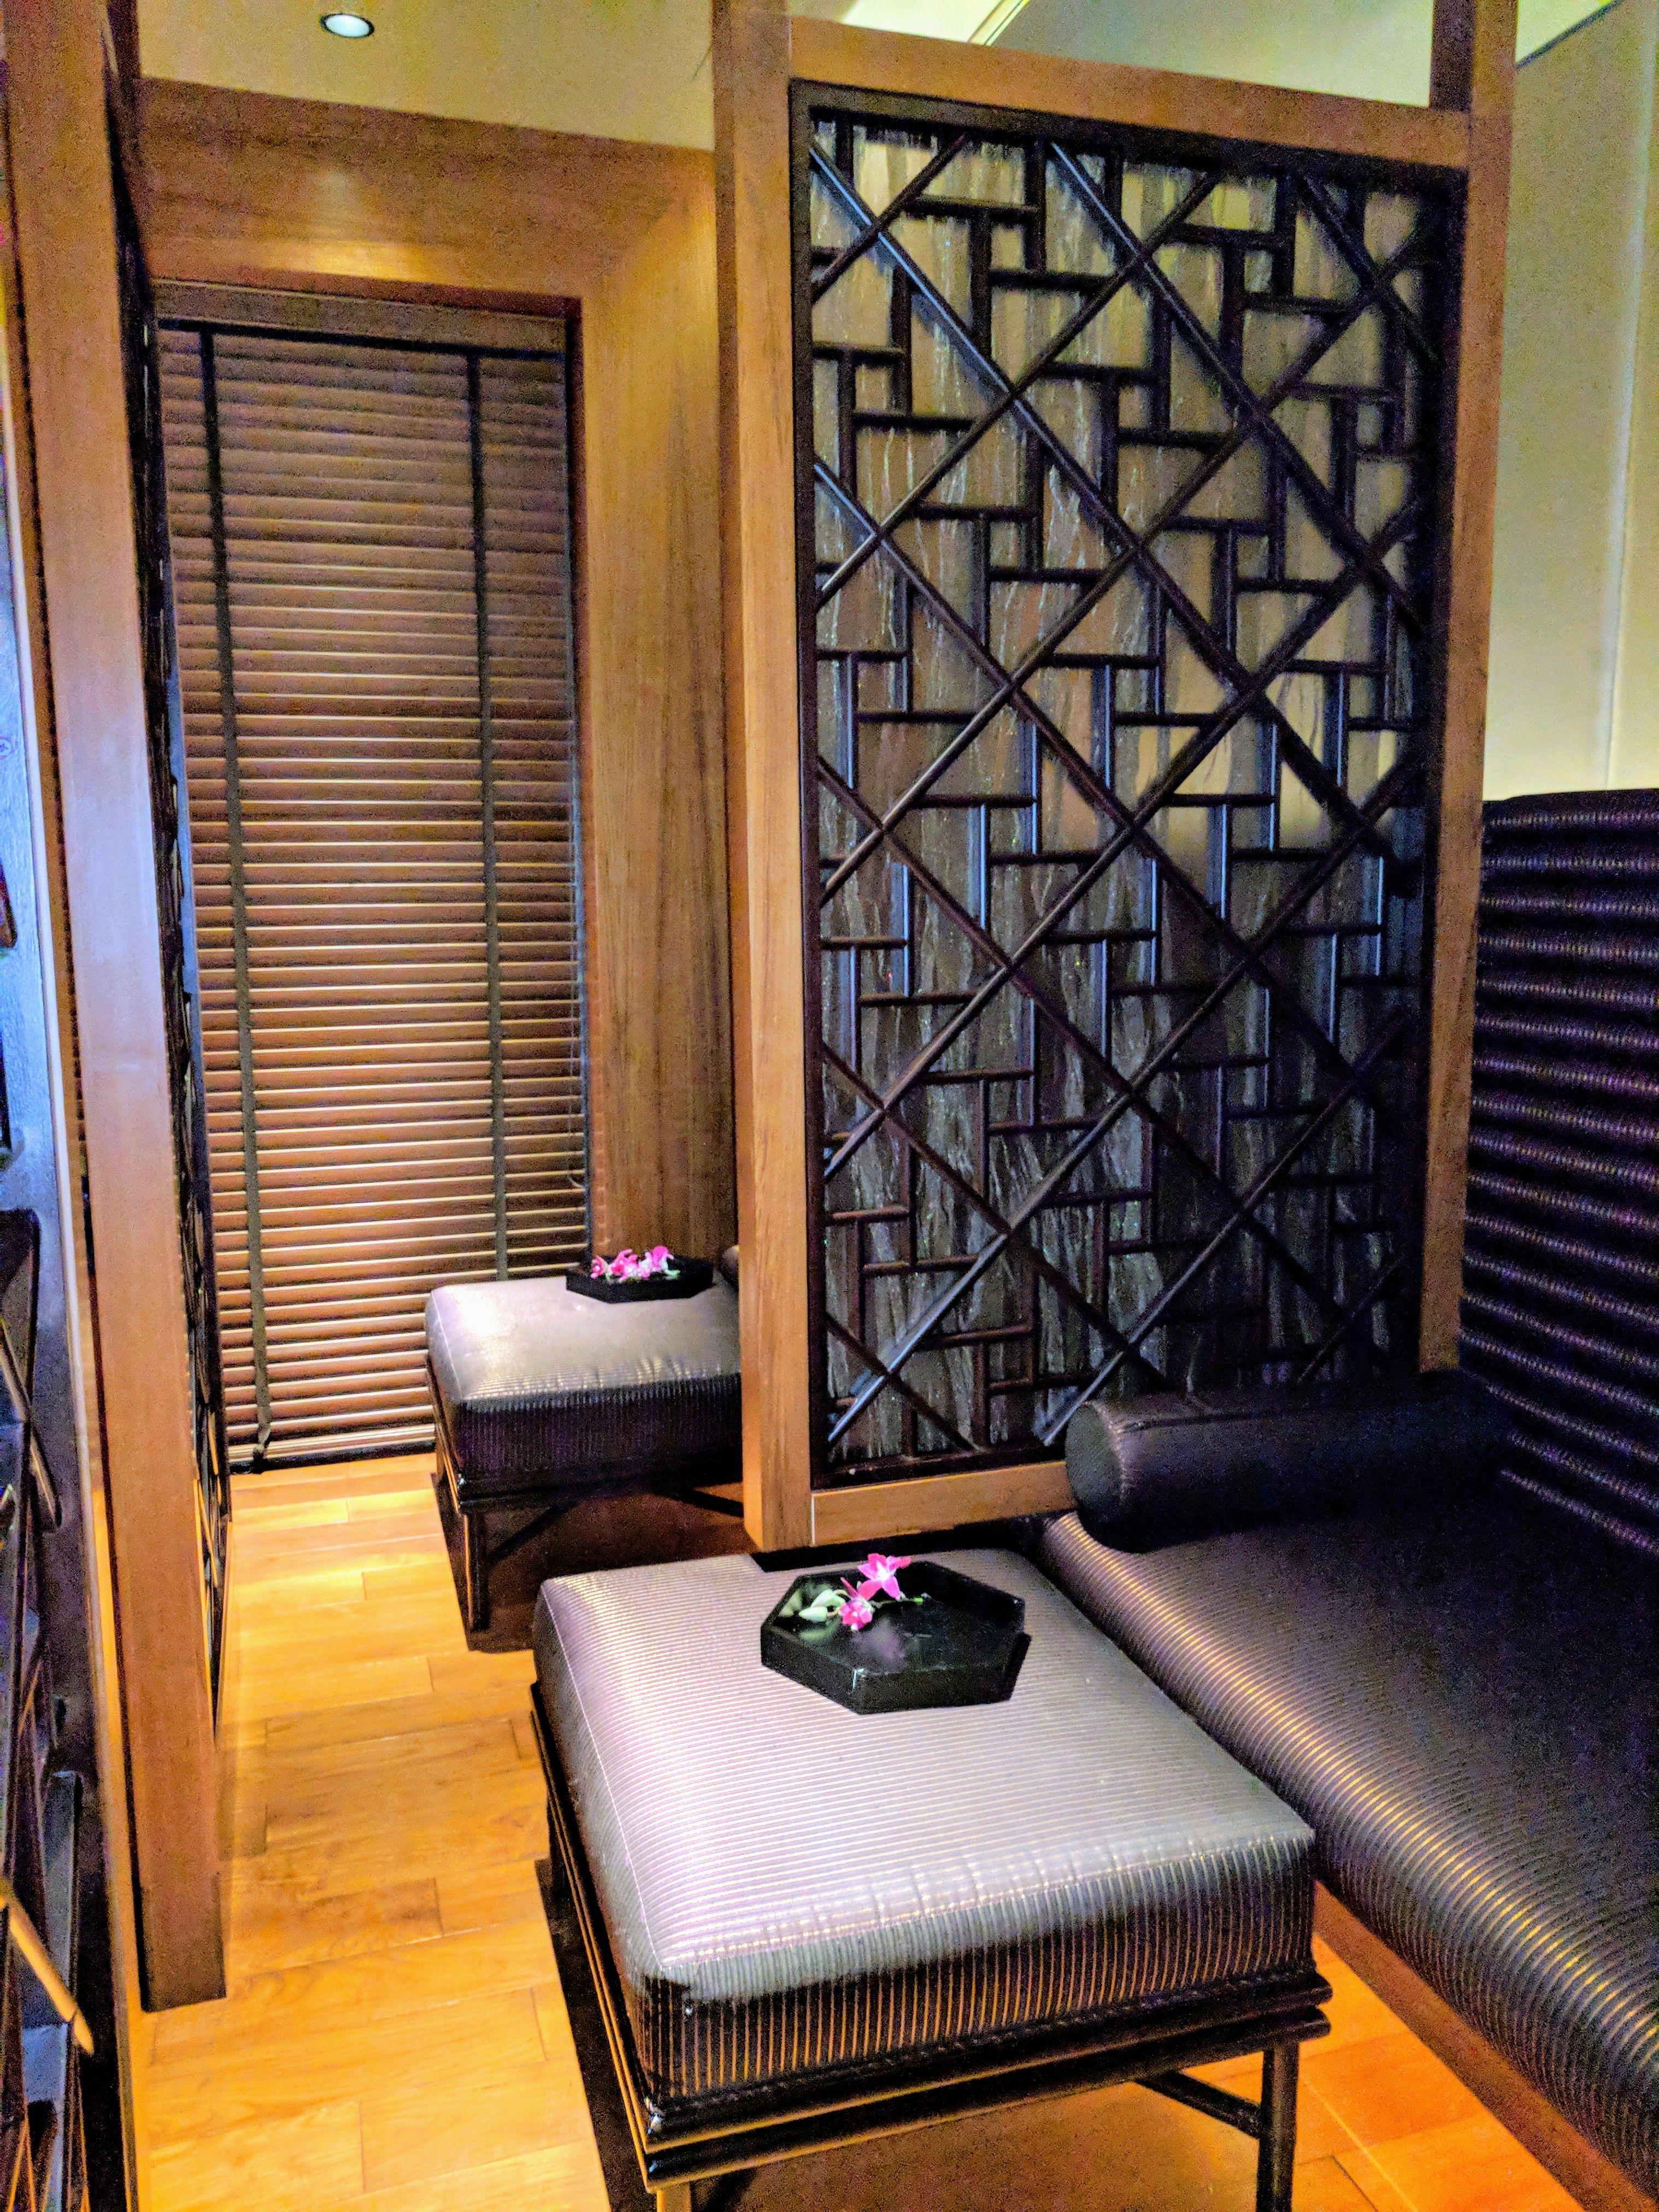 Zen like interior of beautiful relaxation room